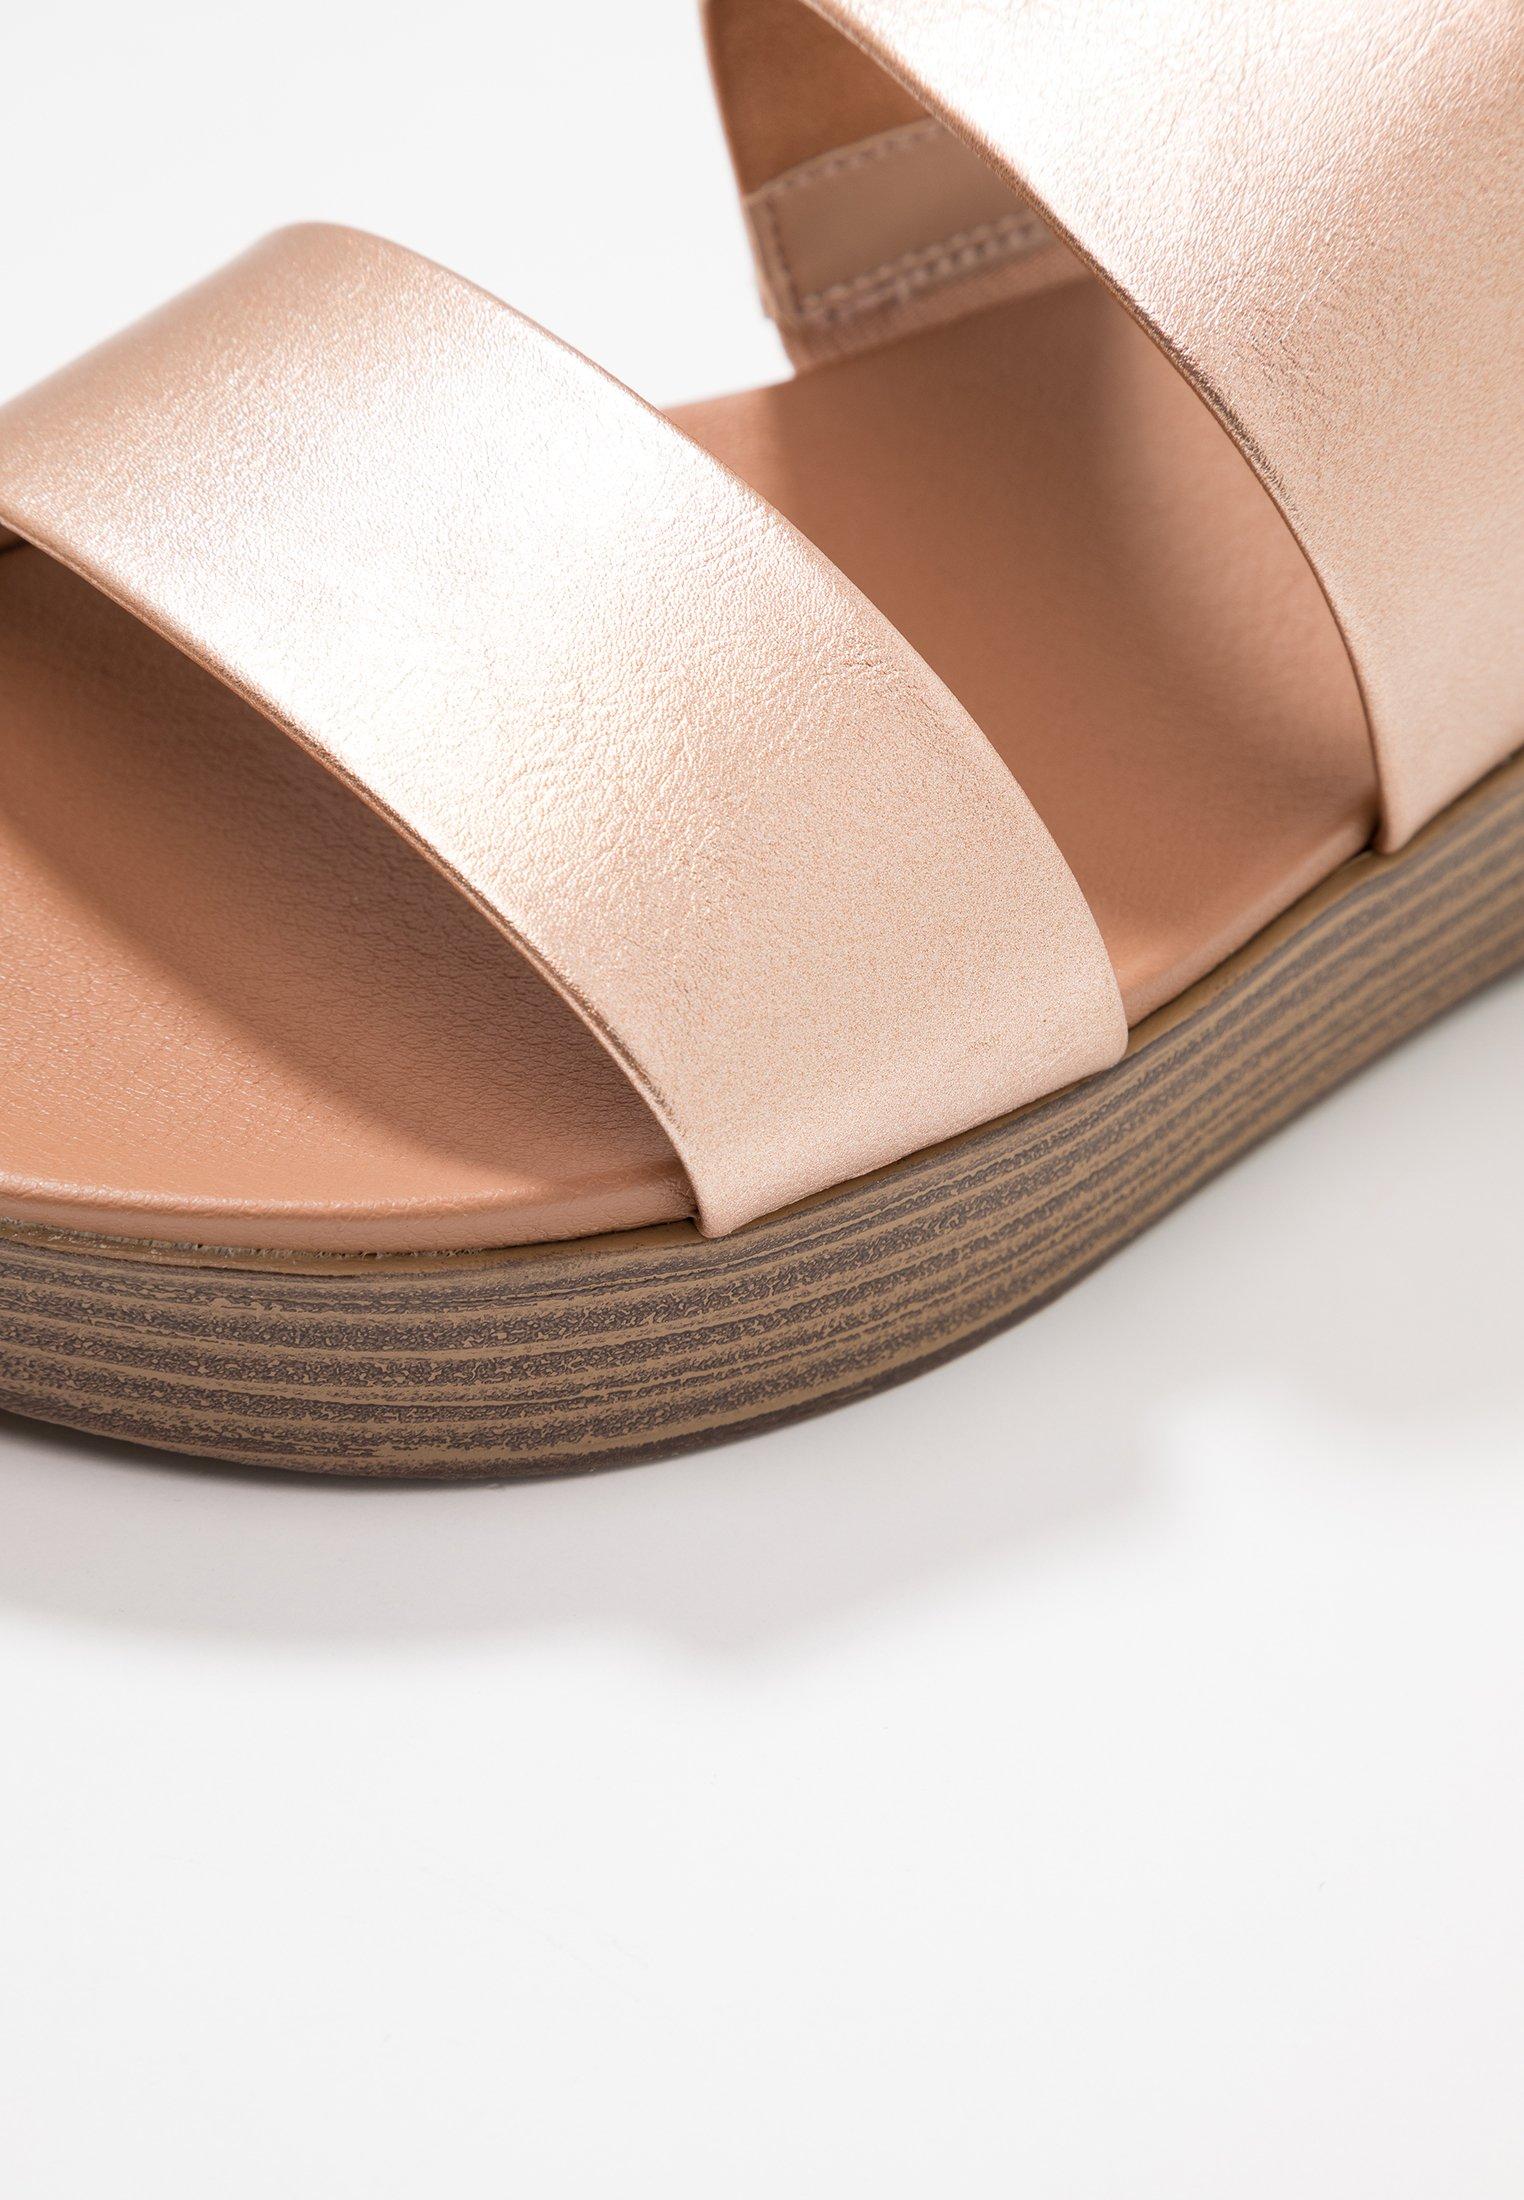 Rose Rosalie MuleMules Perkins Gold Flatform Dorothy QxtCshdr